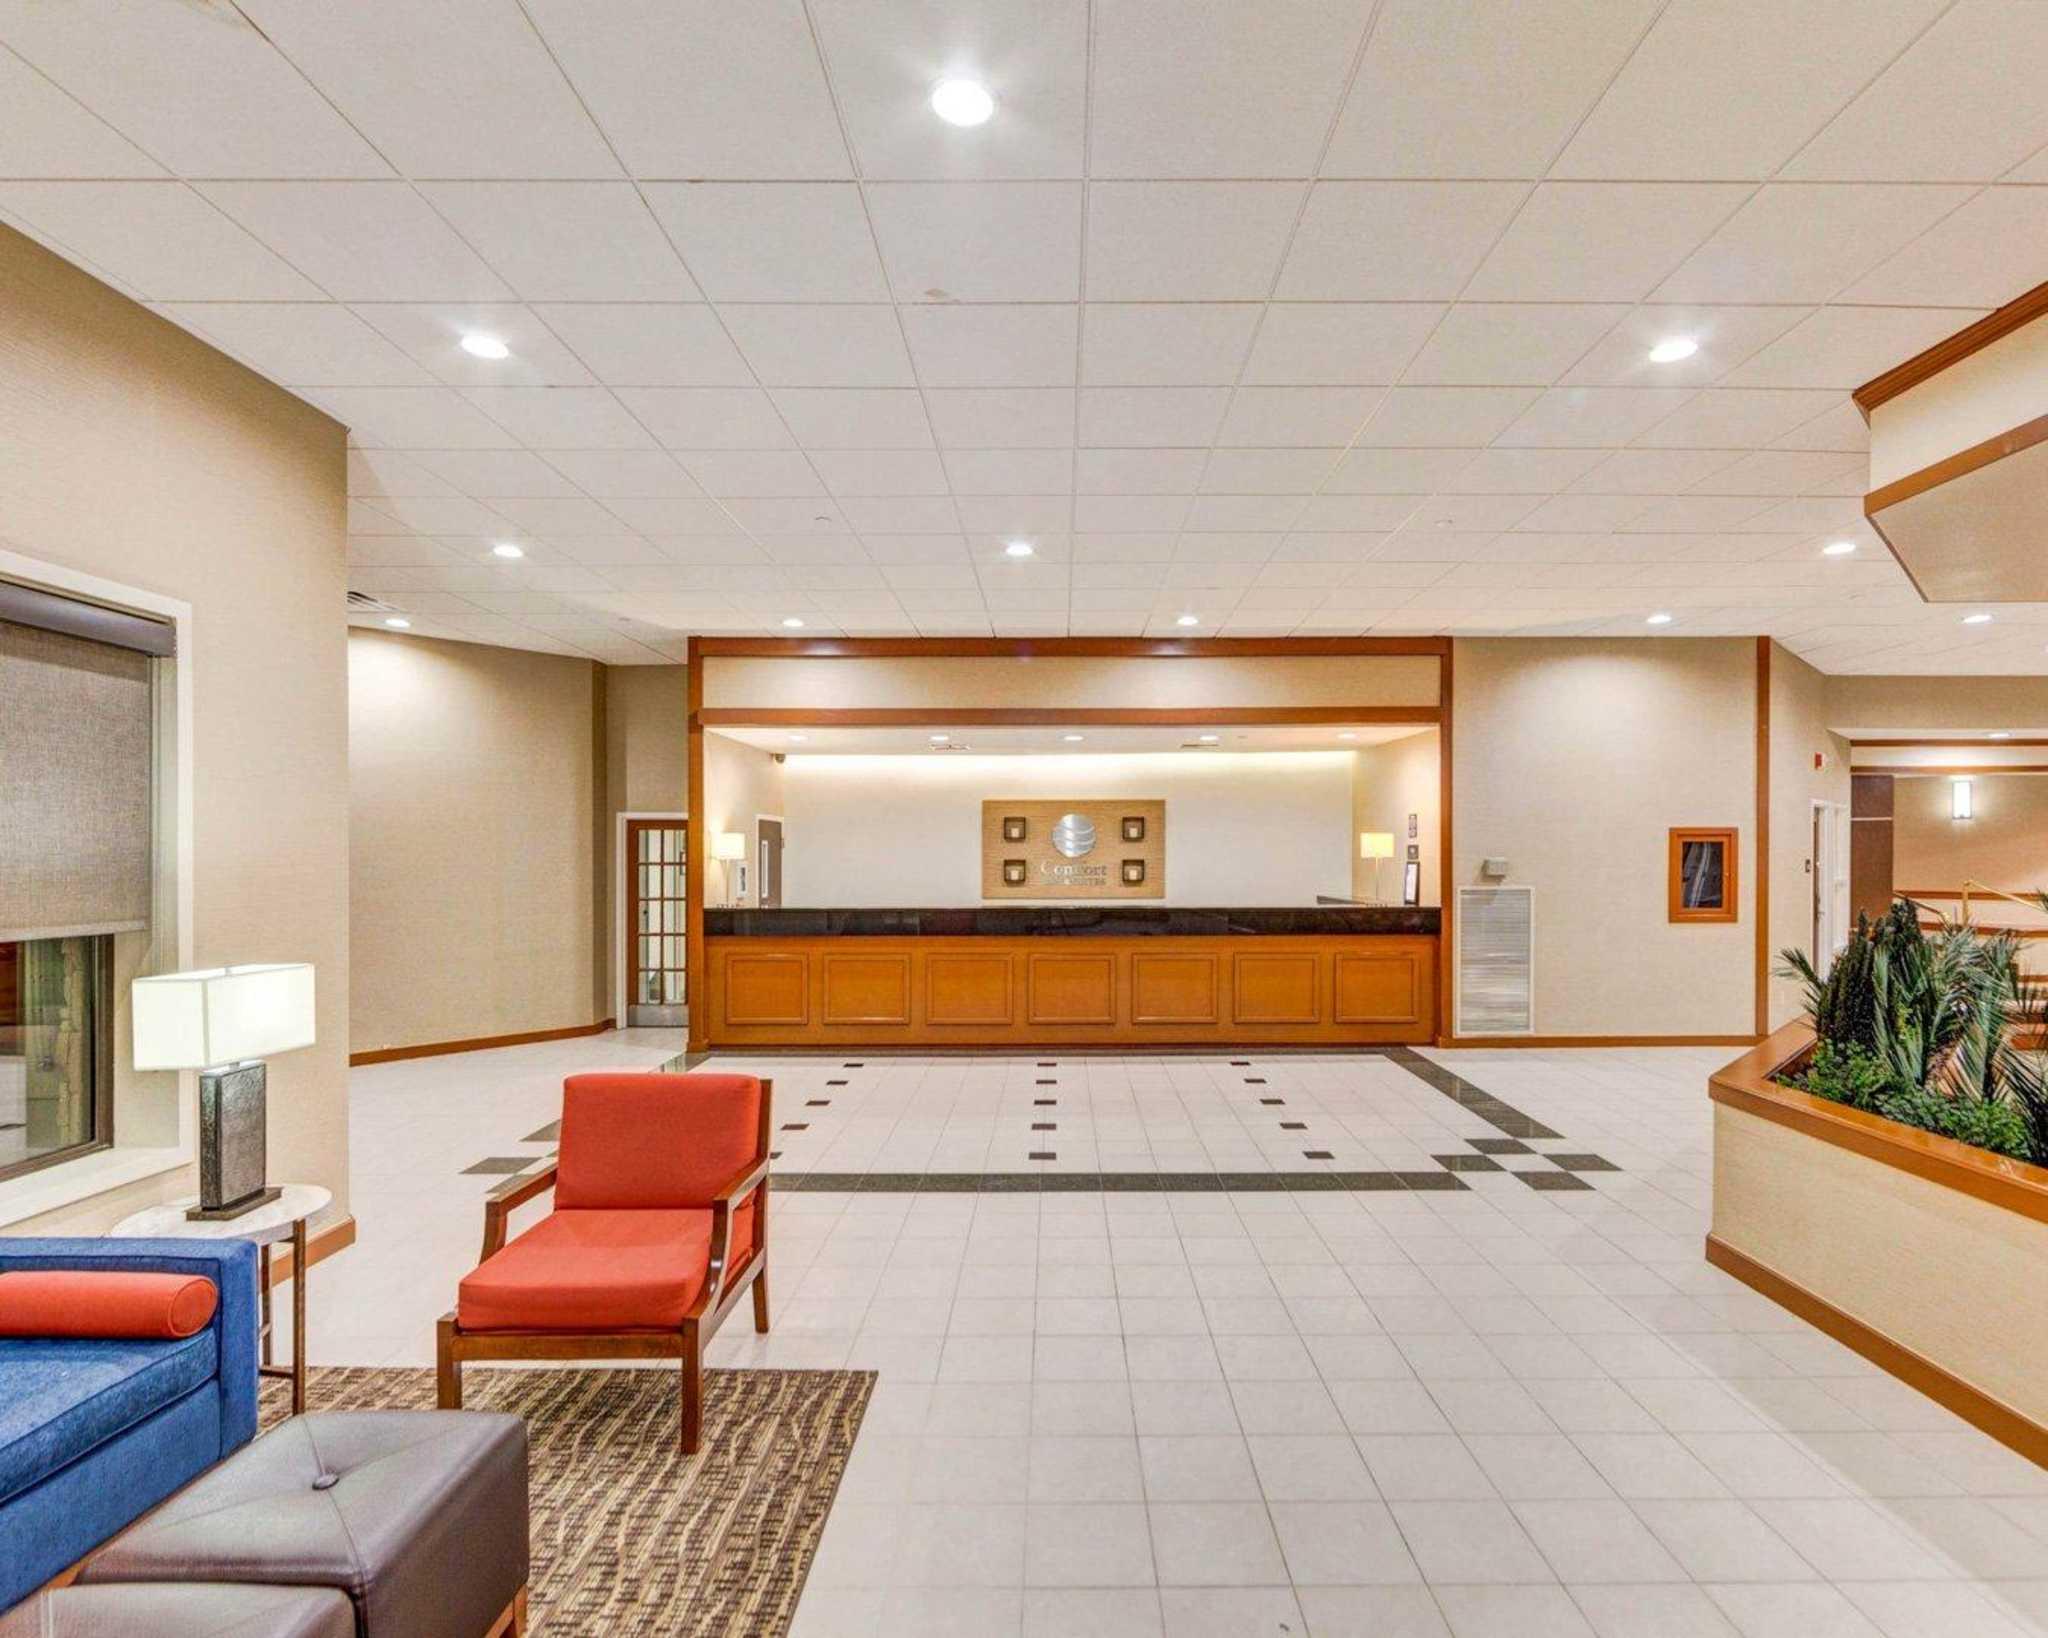 Comfort Inn & Suites Plano East image 14